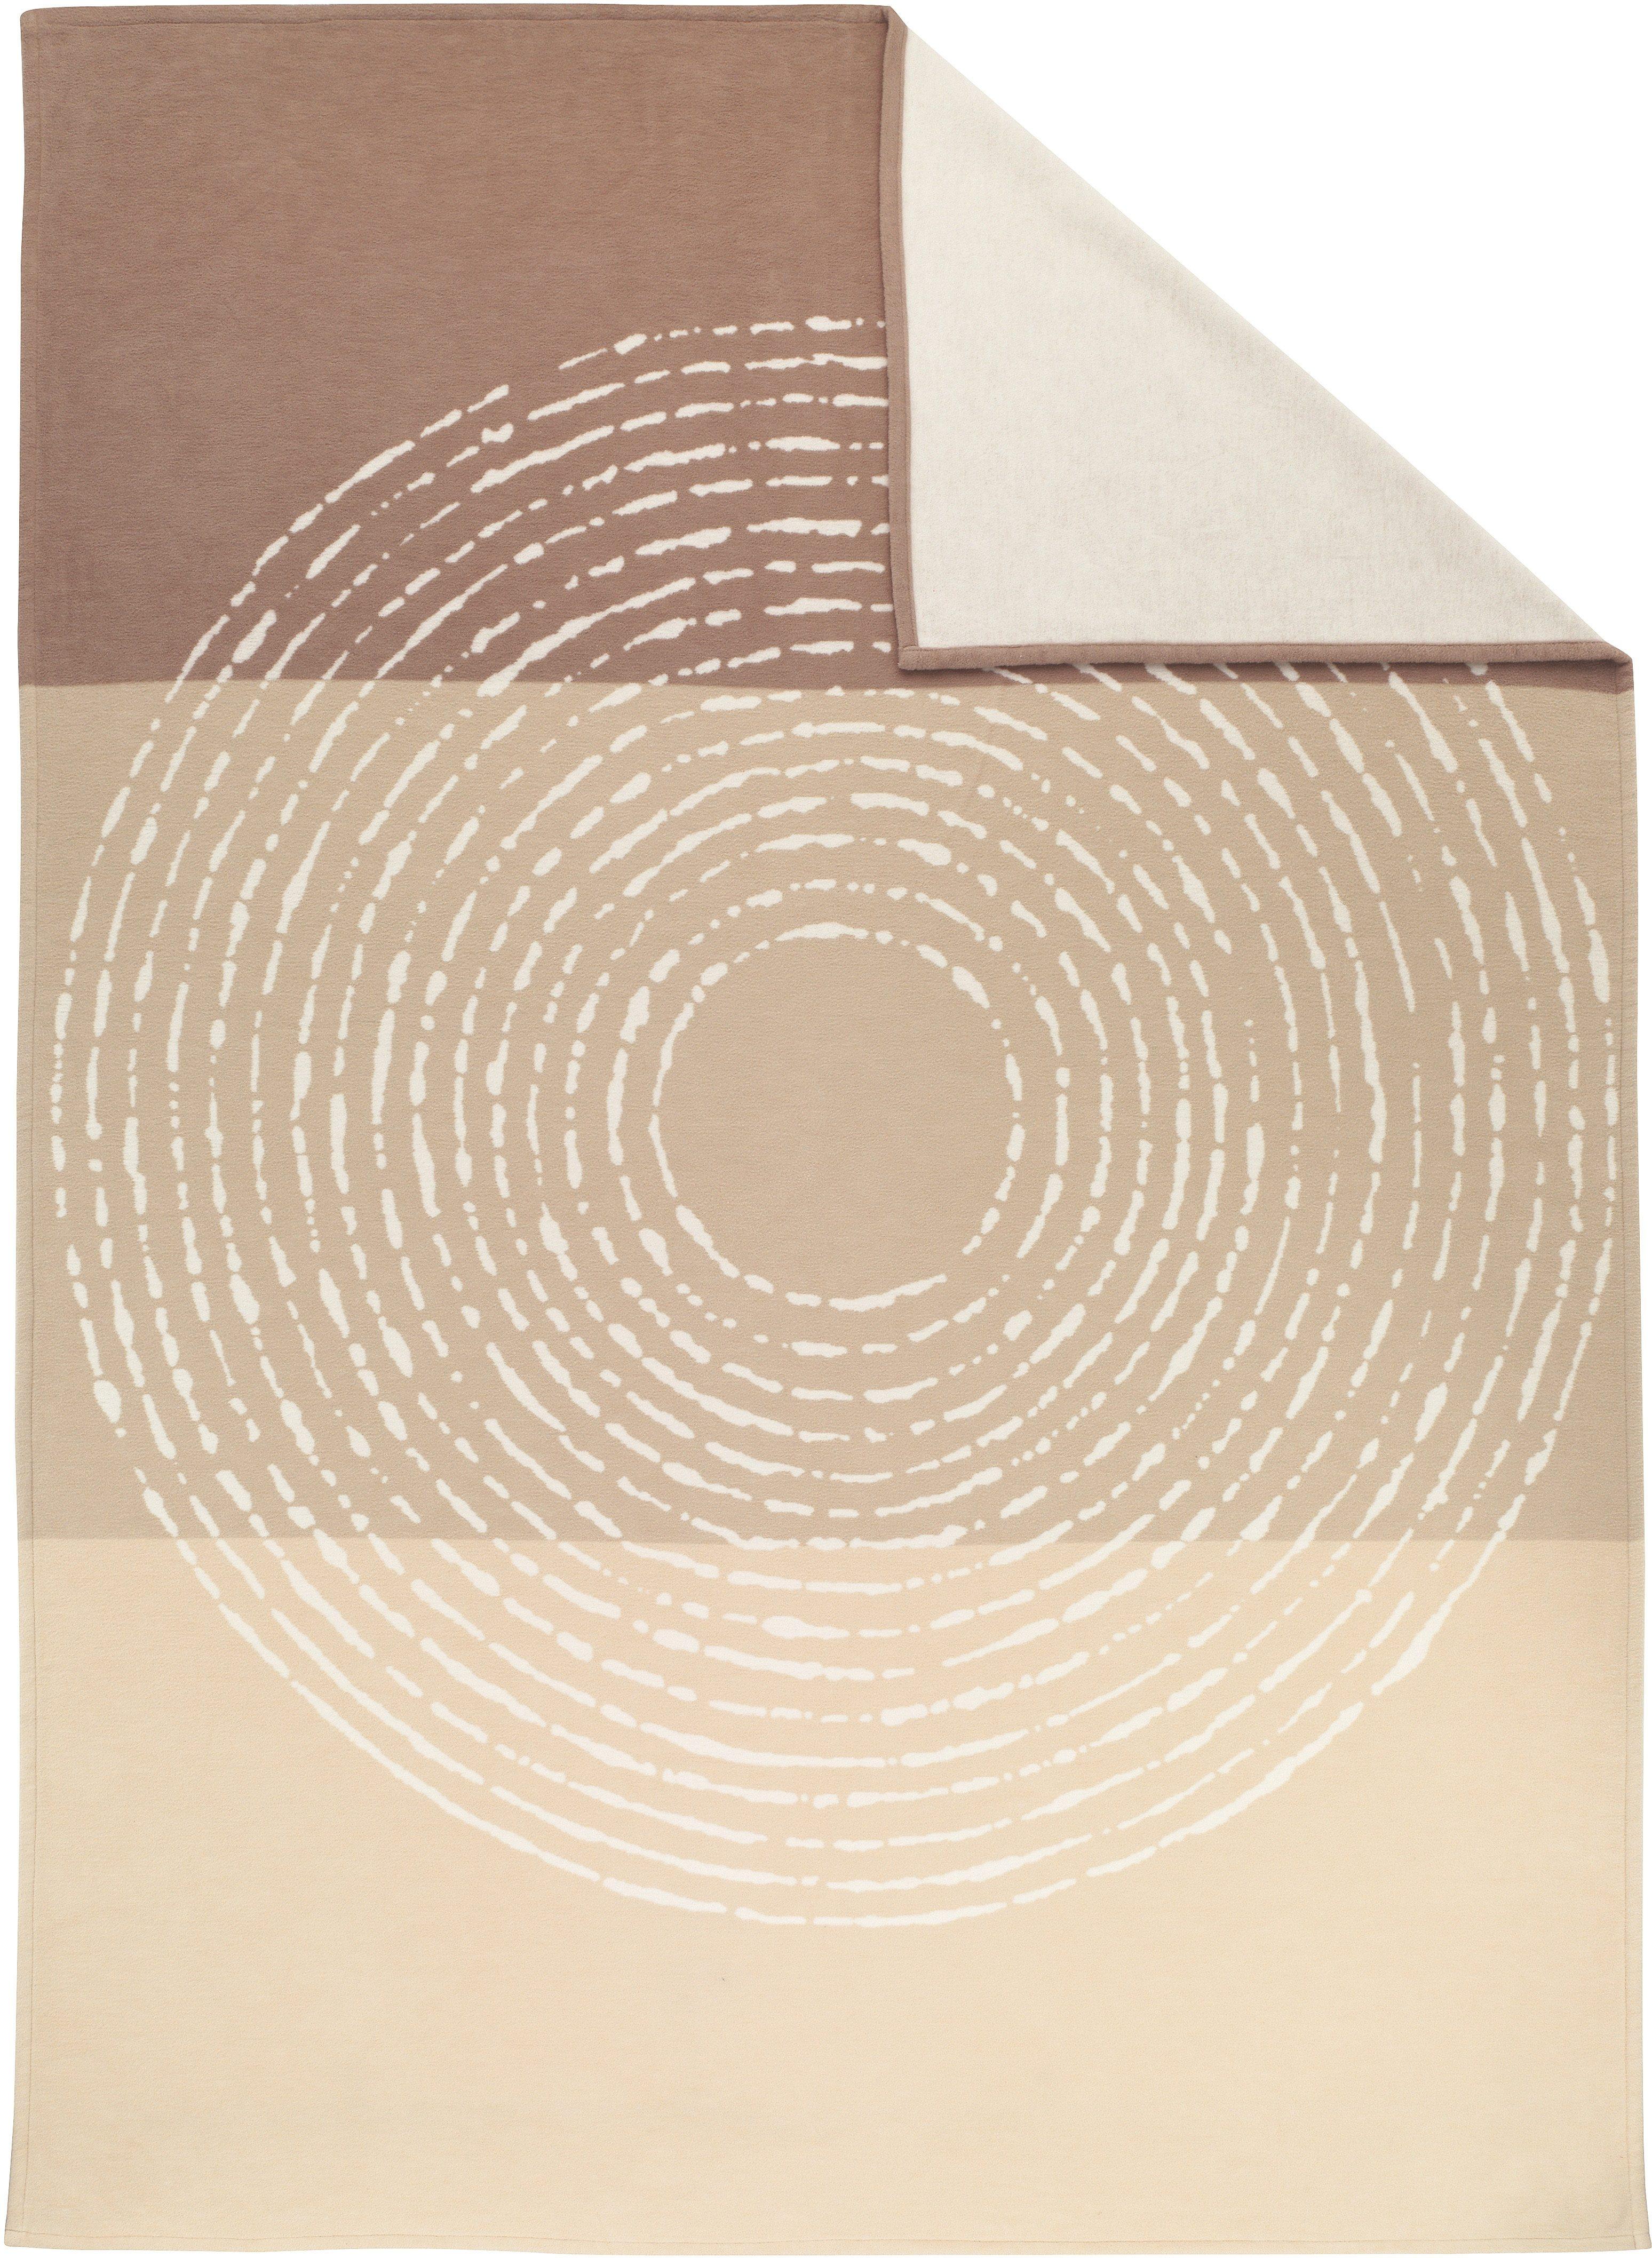 Wohndecke, Ibena, »Cotton Pur Circle«, mit großem Kreis